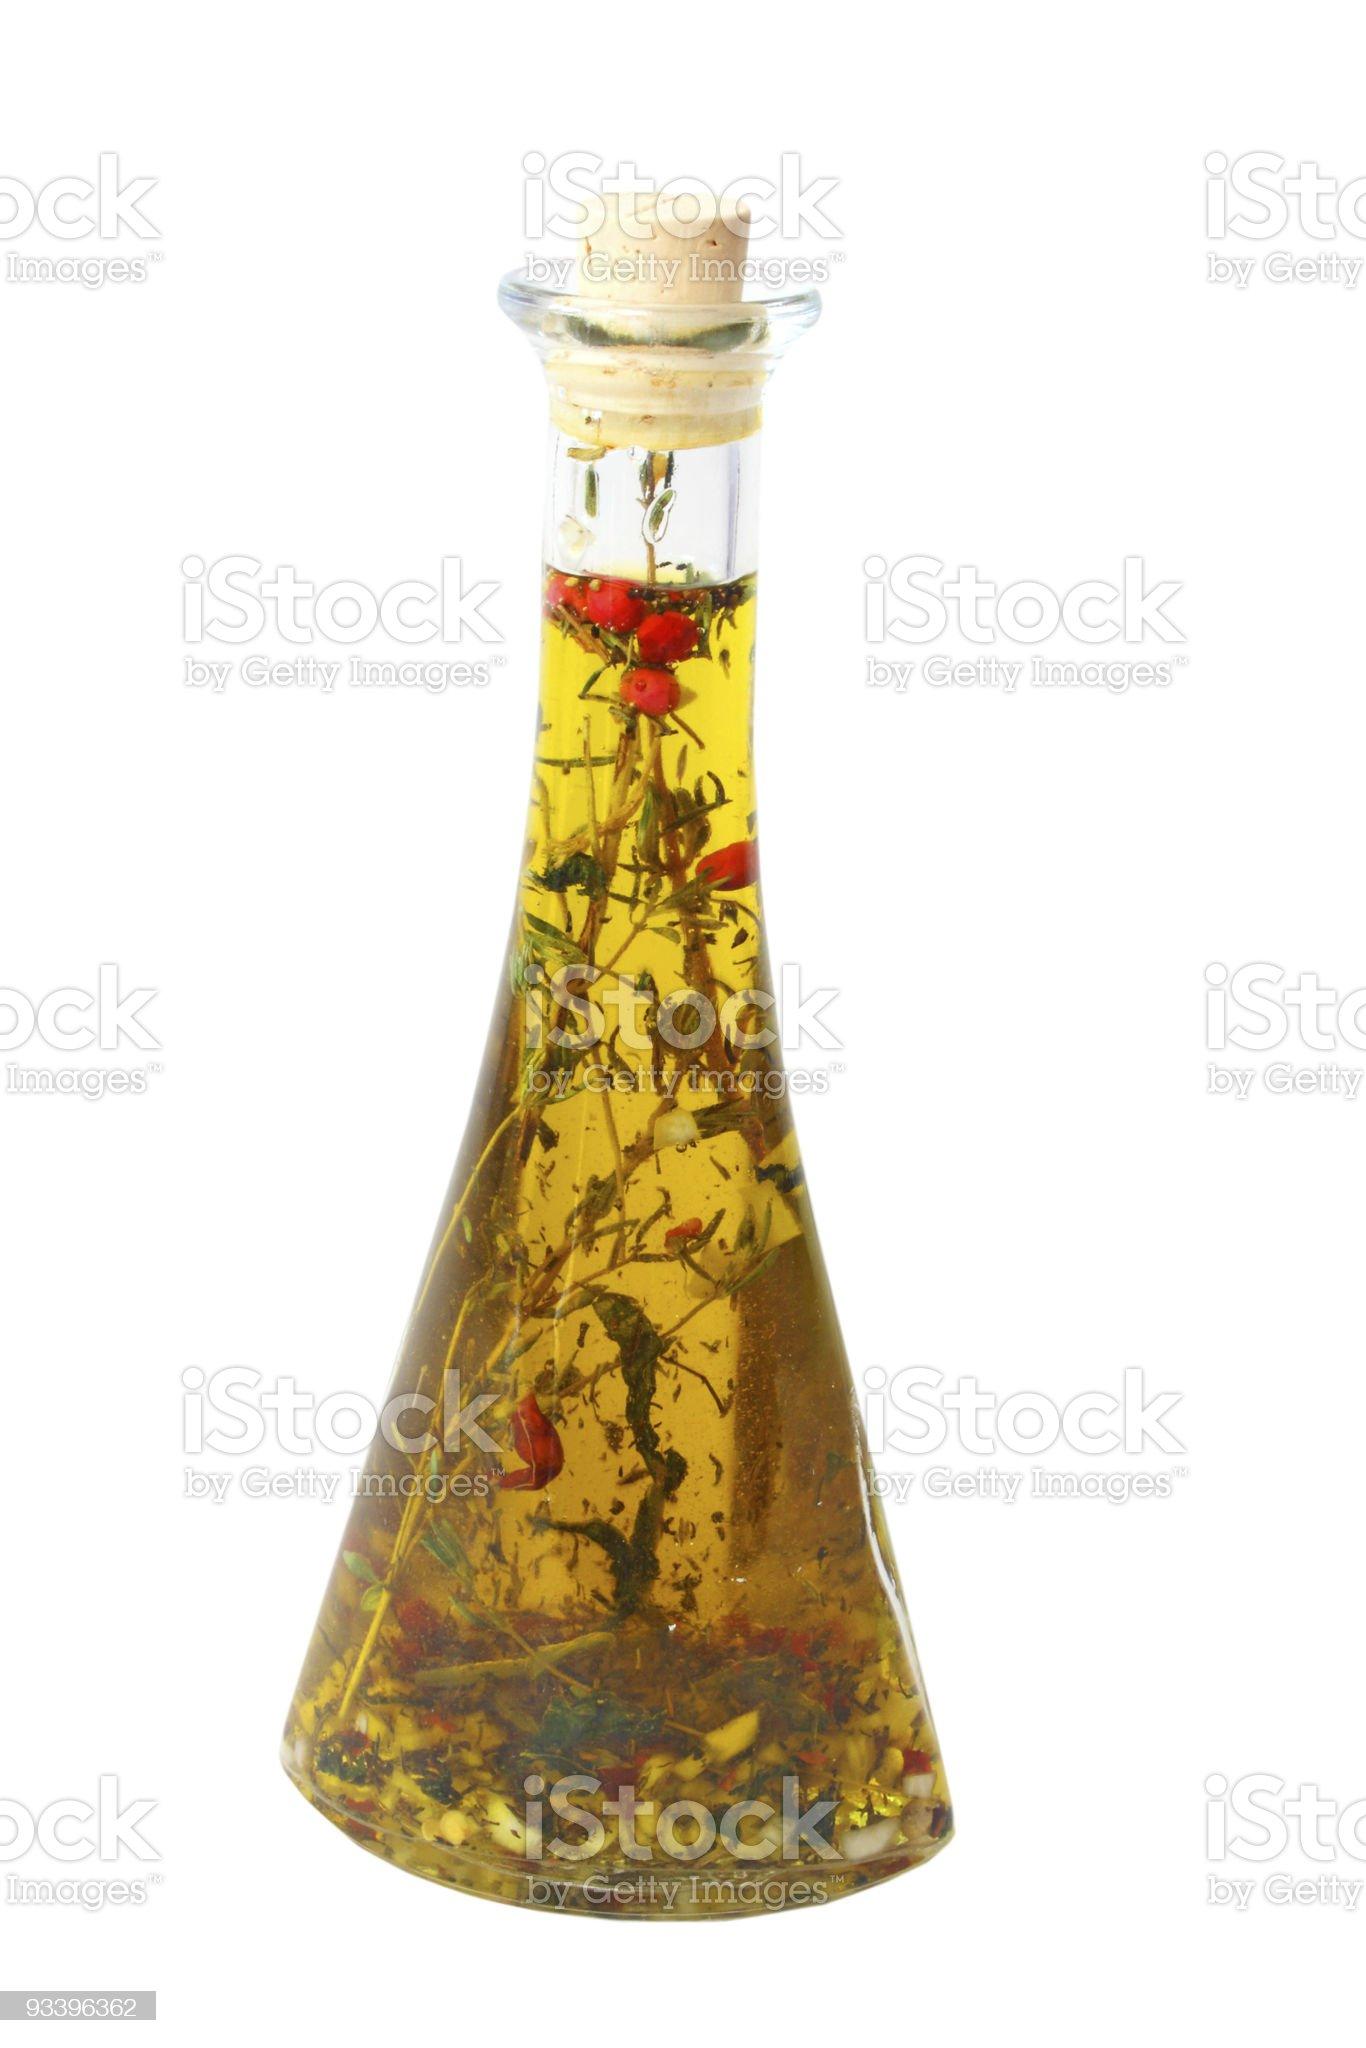 herbal oil royalty-free stock photo